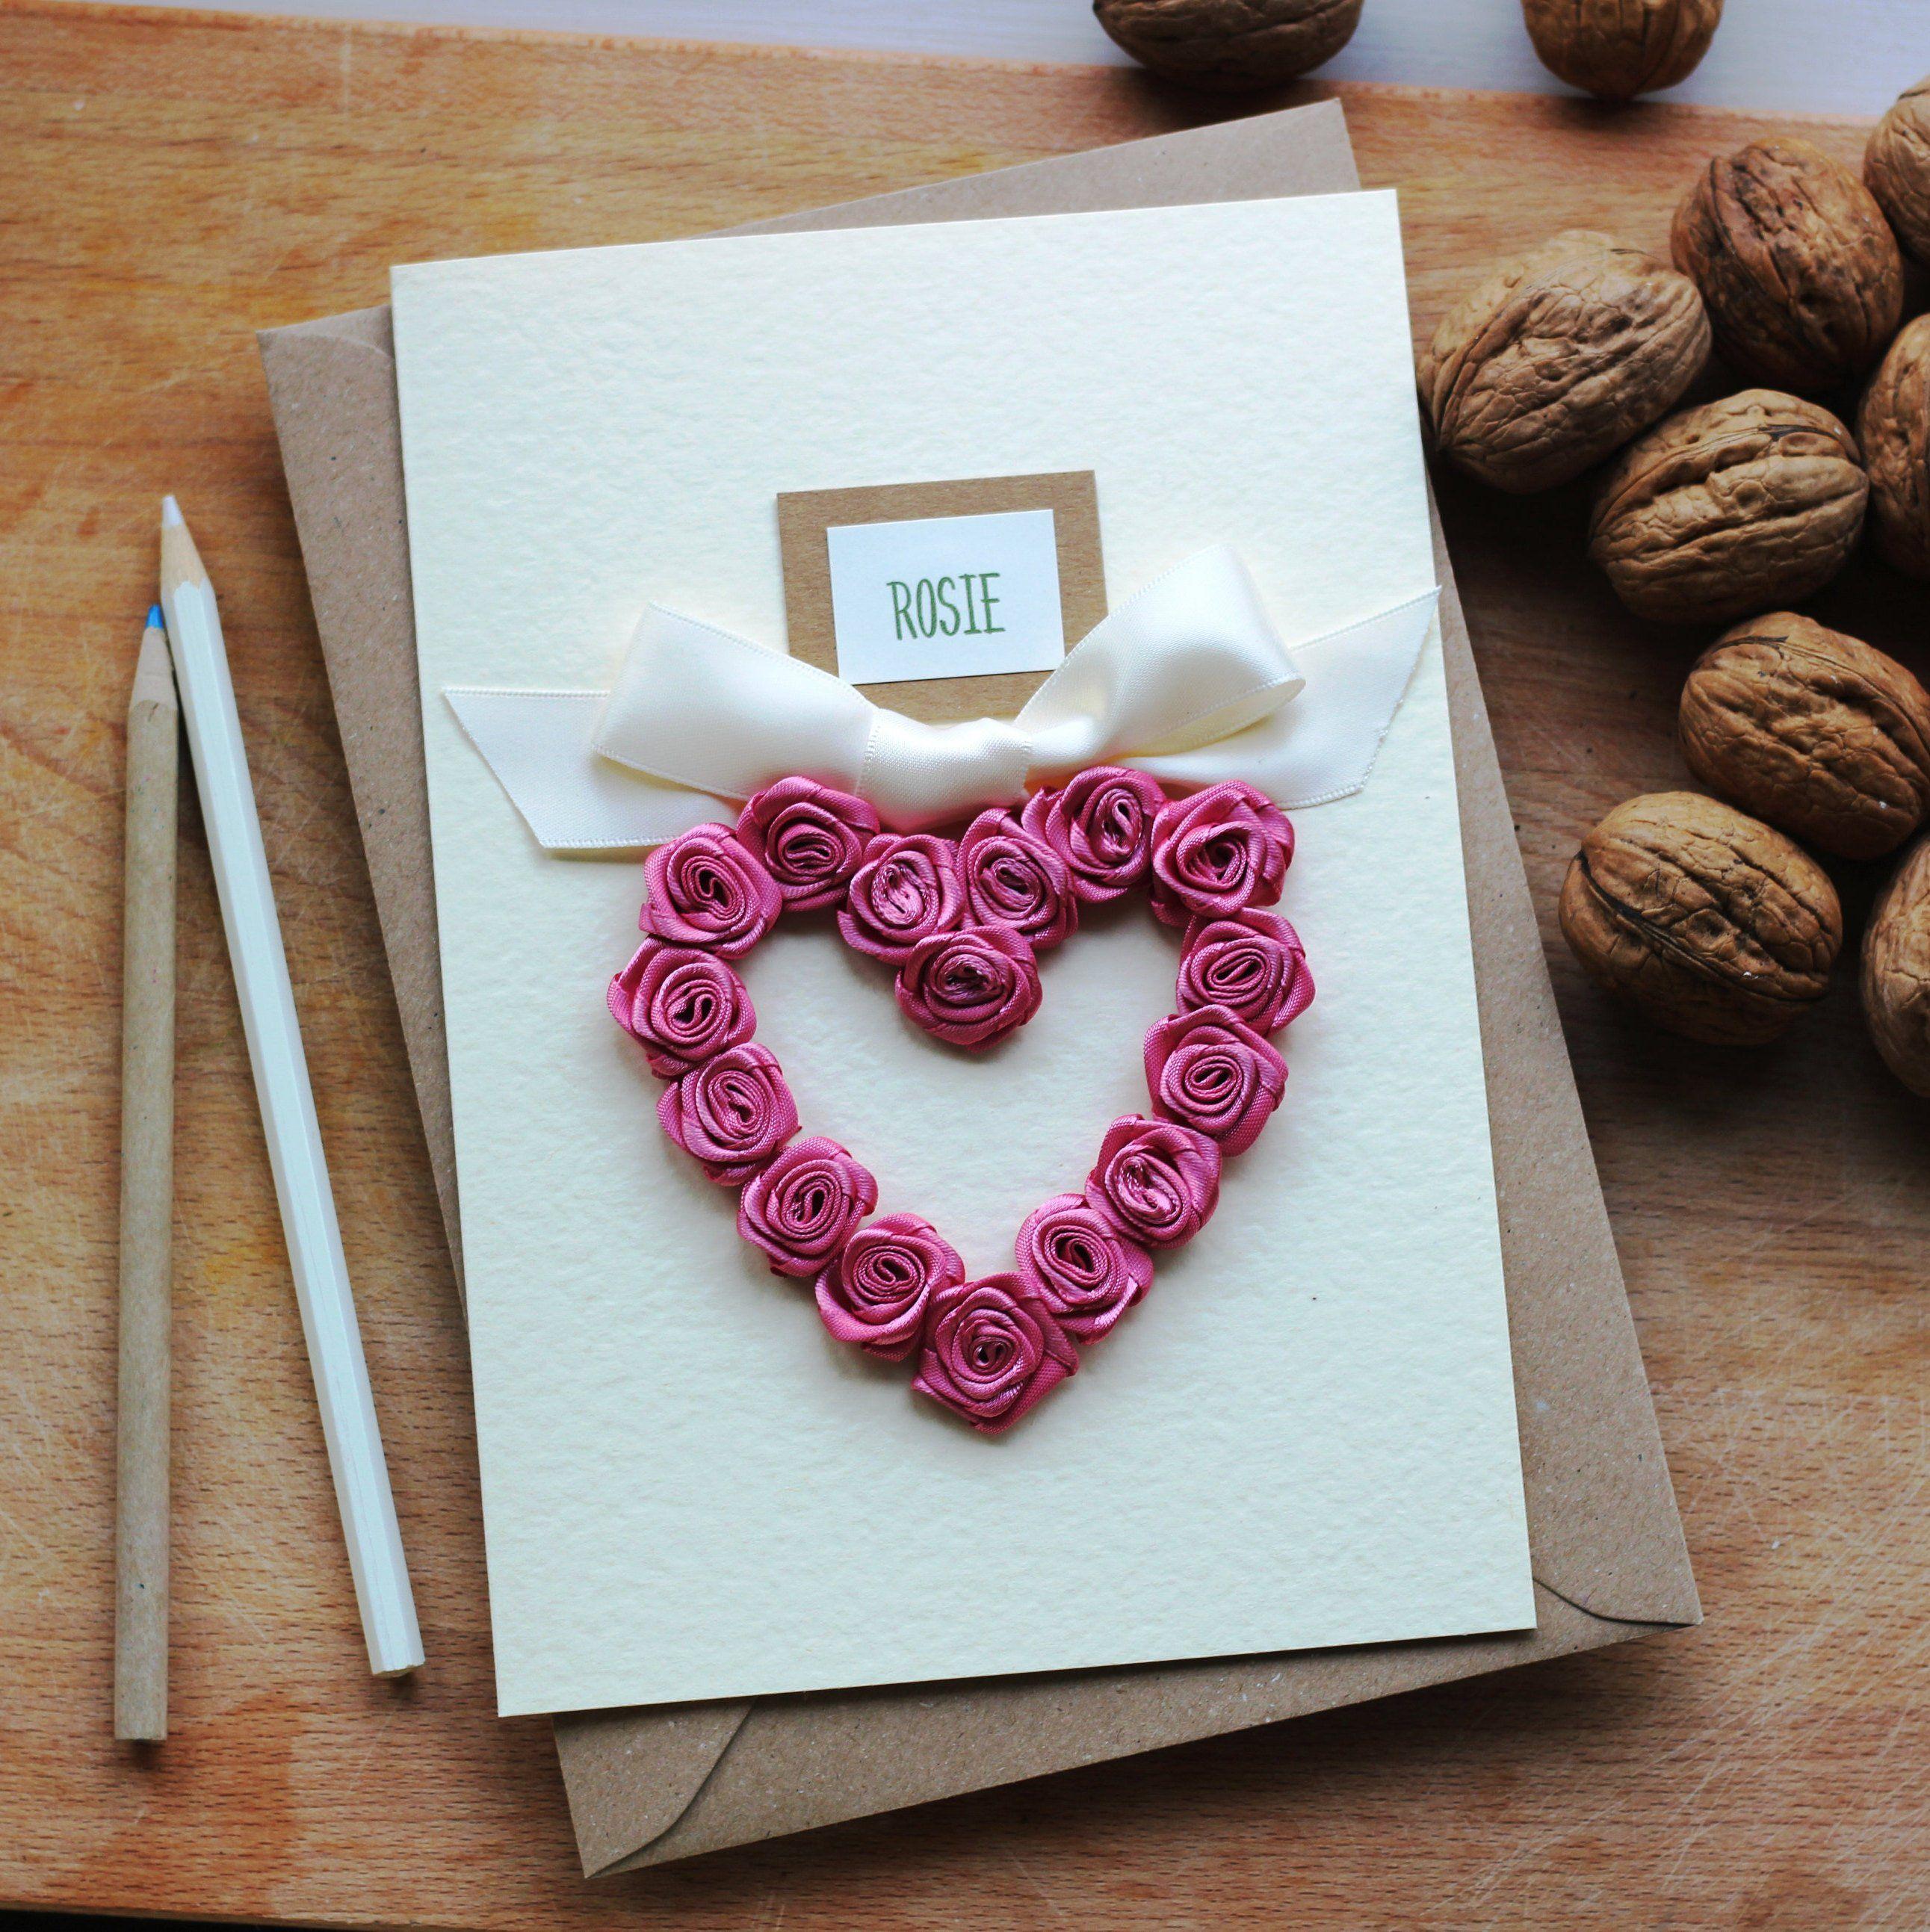 21st Birthday Card Daughter Girlfriend Granddaughter Niece Etsy 21st Birthday Cards Niece Gifts Birthday Cards